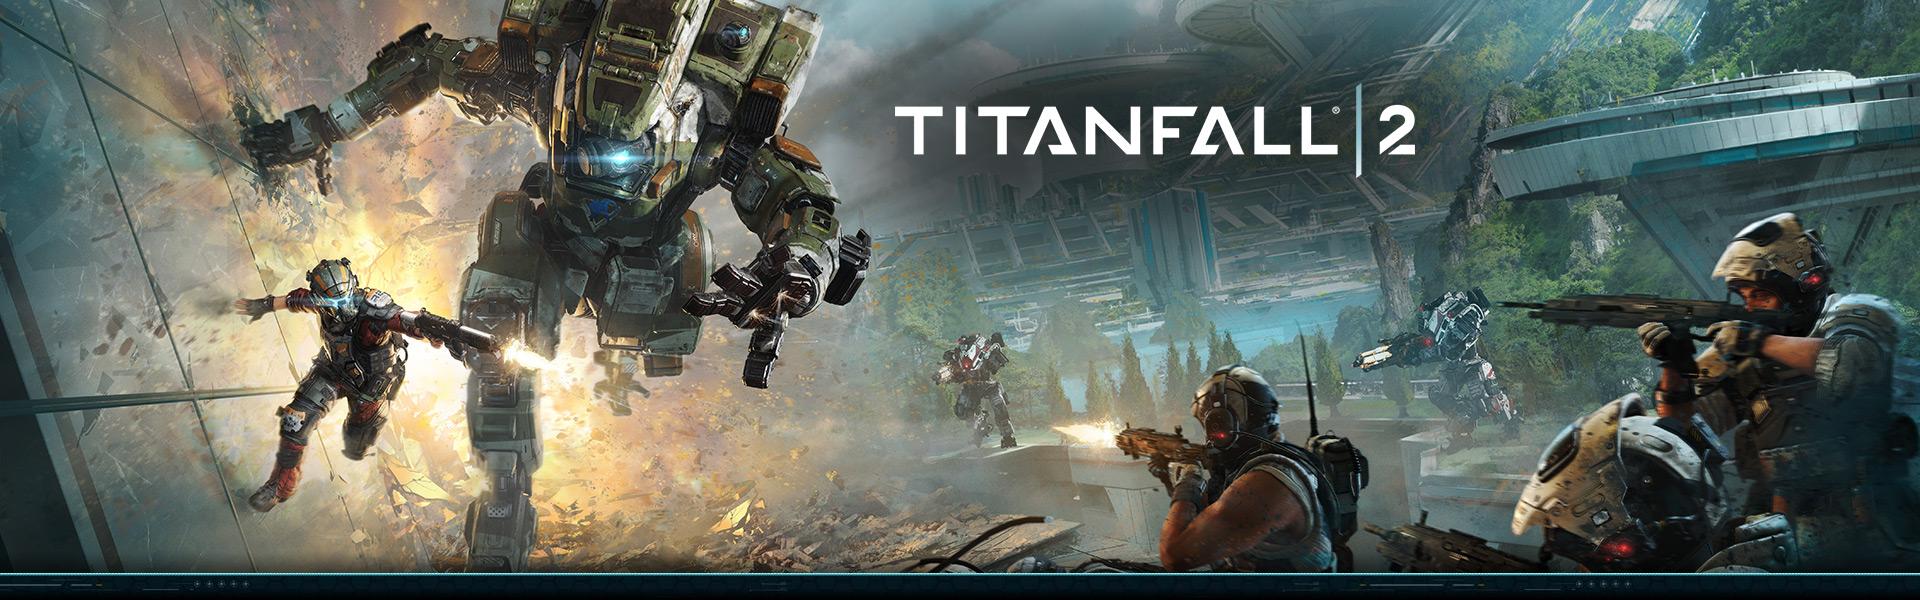 《Titanfall 2》士兵戰鬥